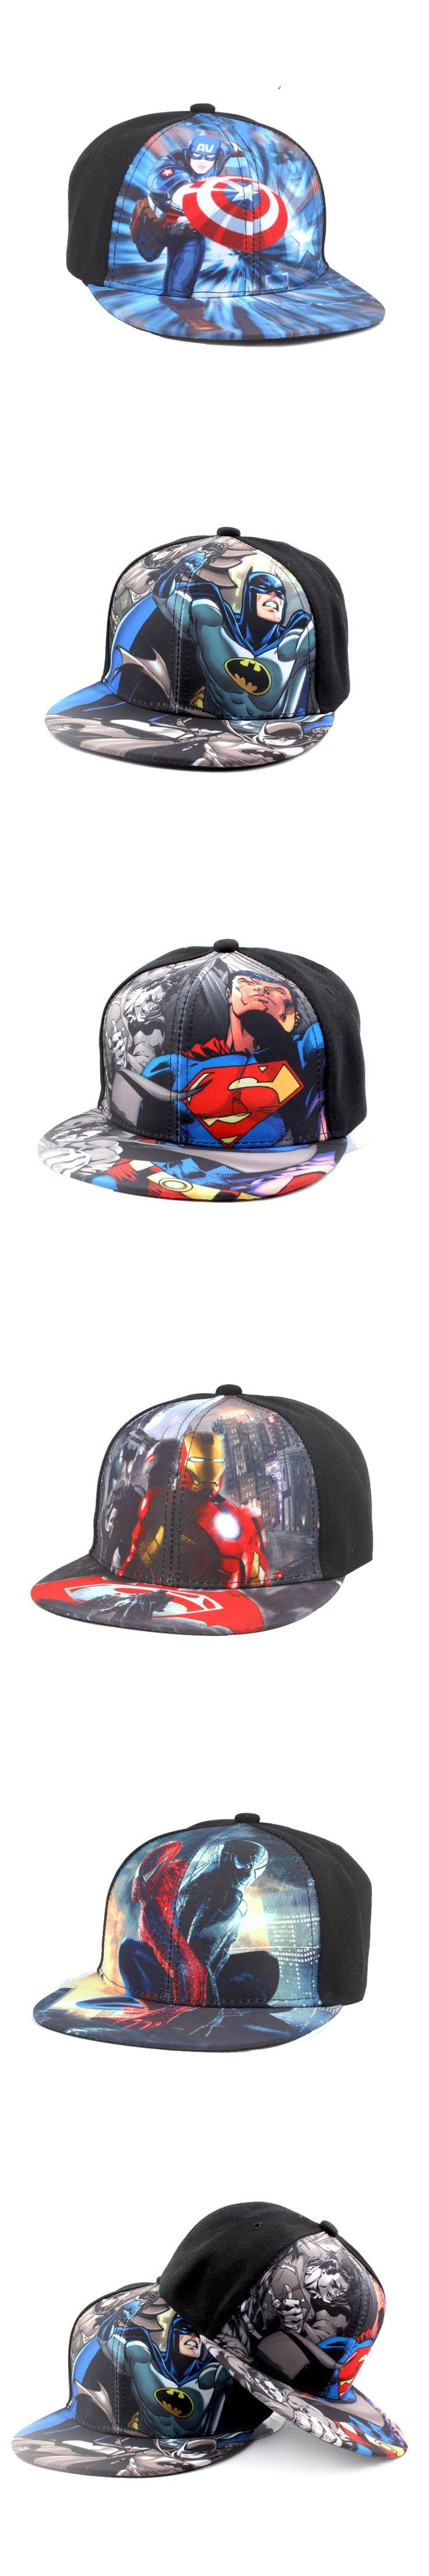 2017 New Batman VS Superman fashion spiderman Iron man cartoon casual mesh cap hip-hop baseball hat adjustable for kids boy girl